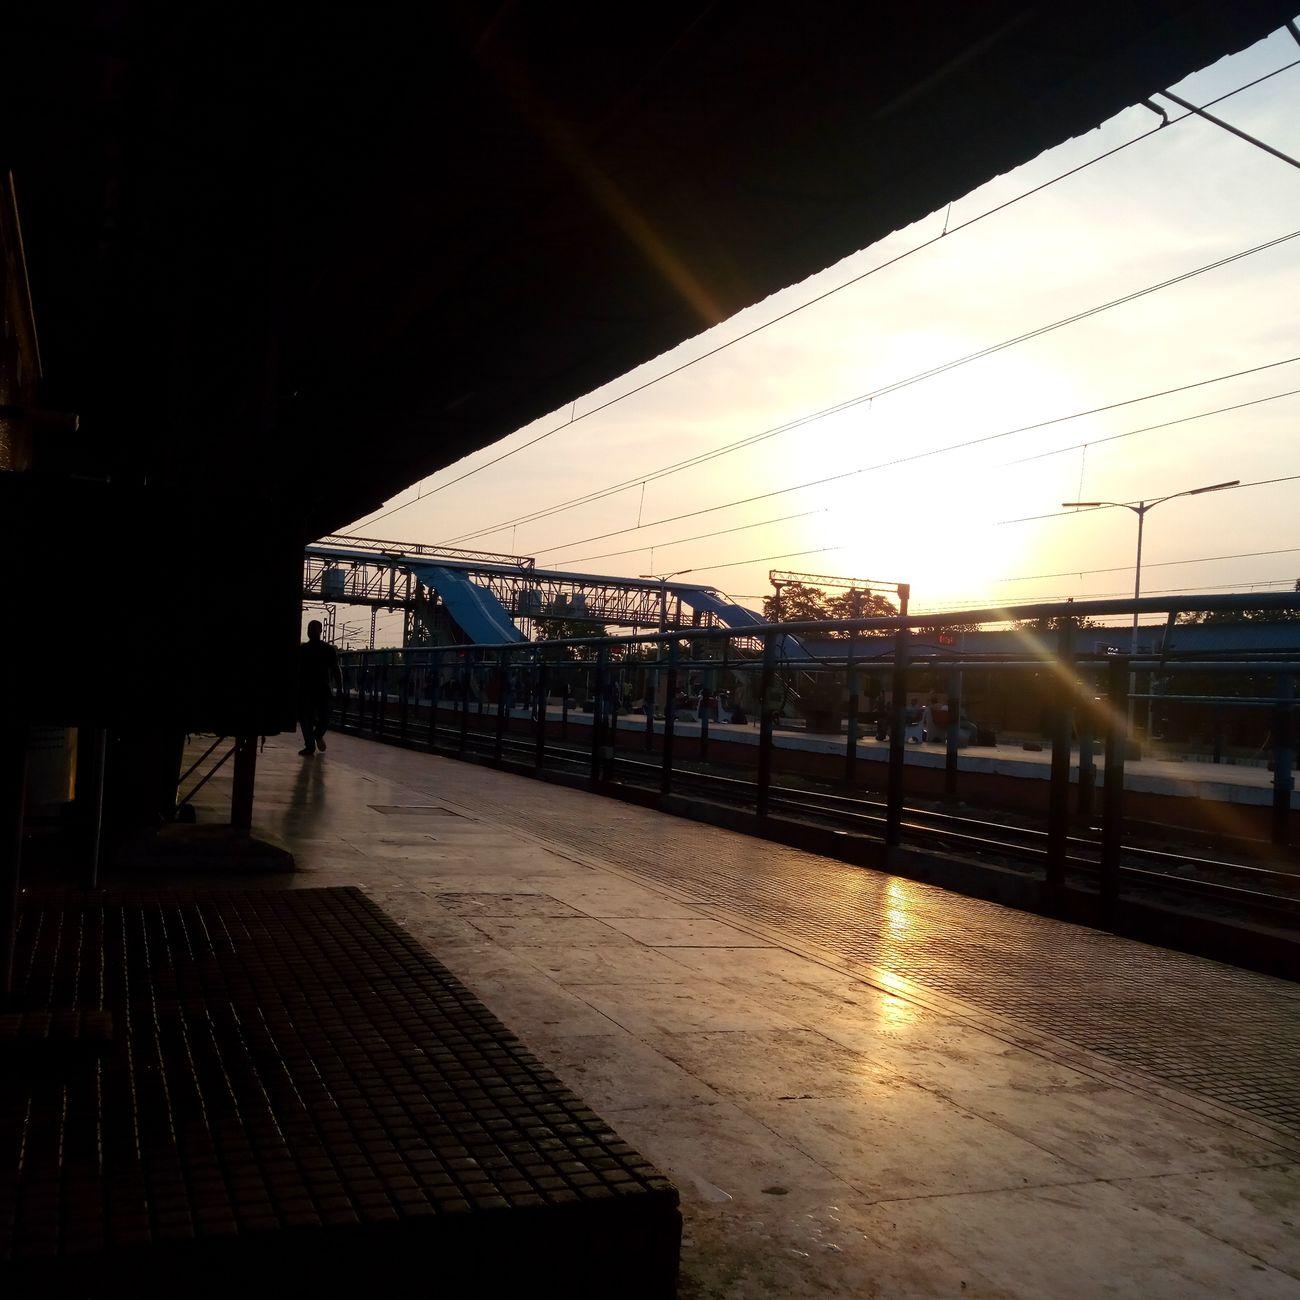 Morning in indian railway station. First Eyeem Photo Follow4follow Visakhapatnam Followback Sunrise Photography India_clicks